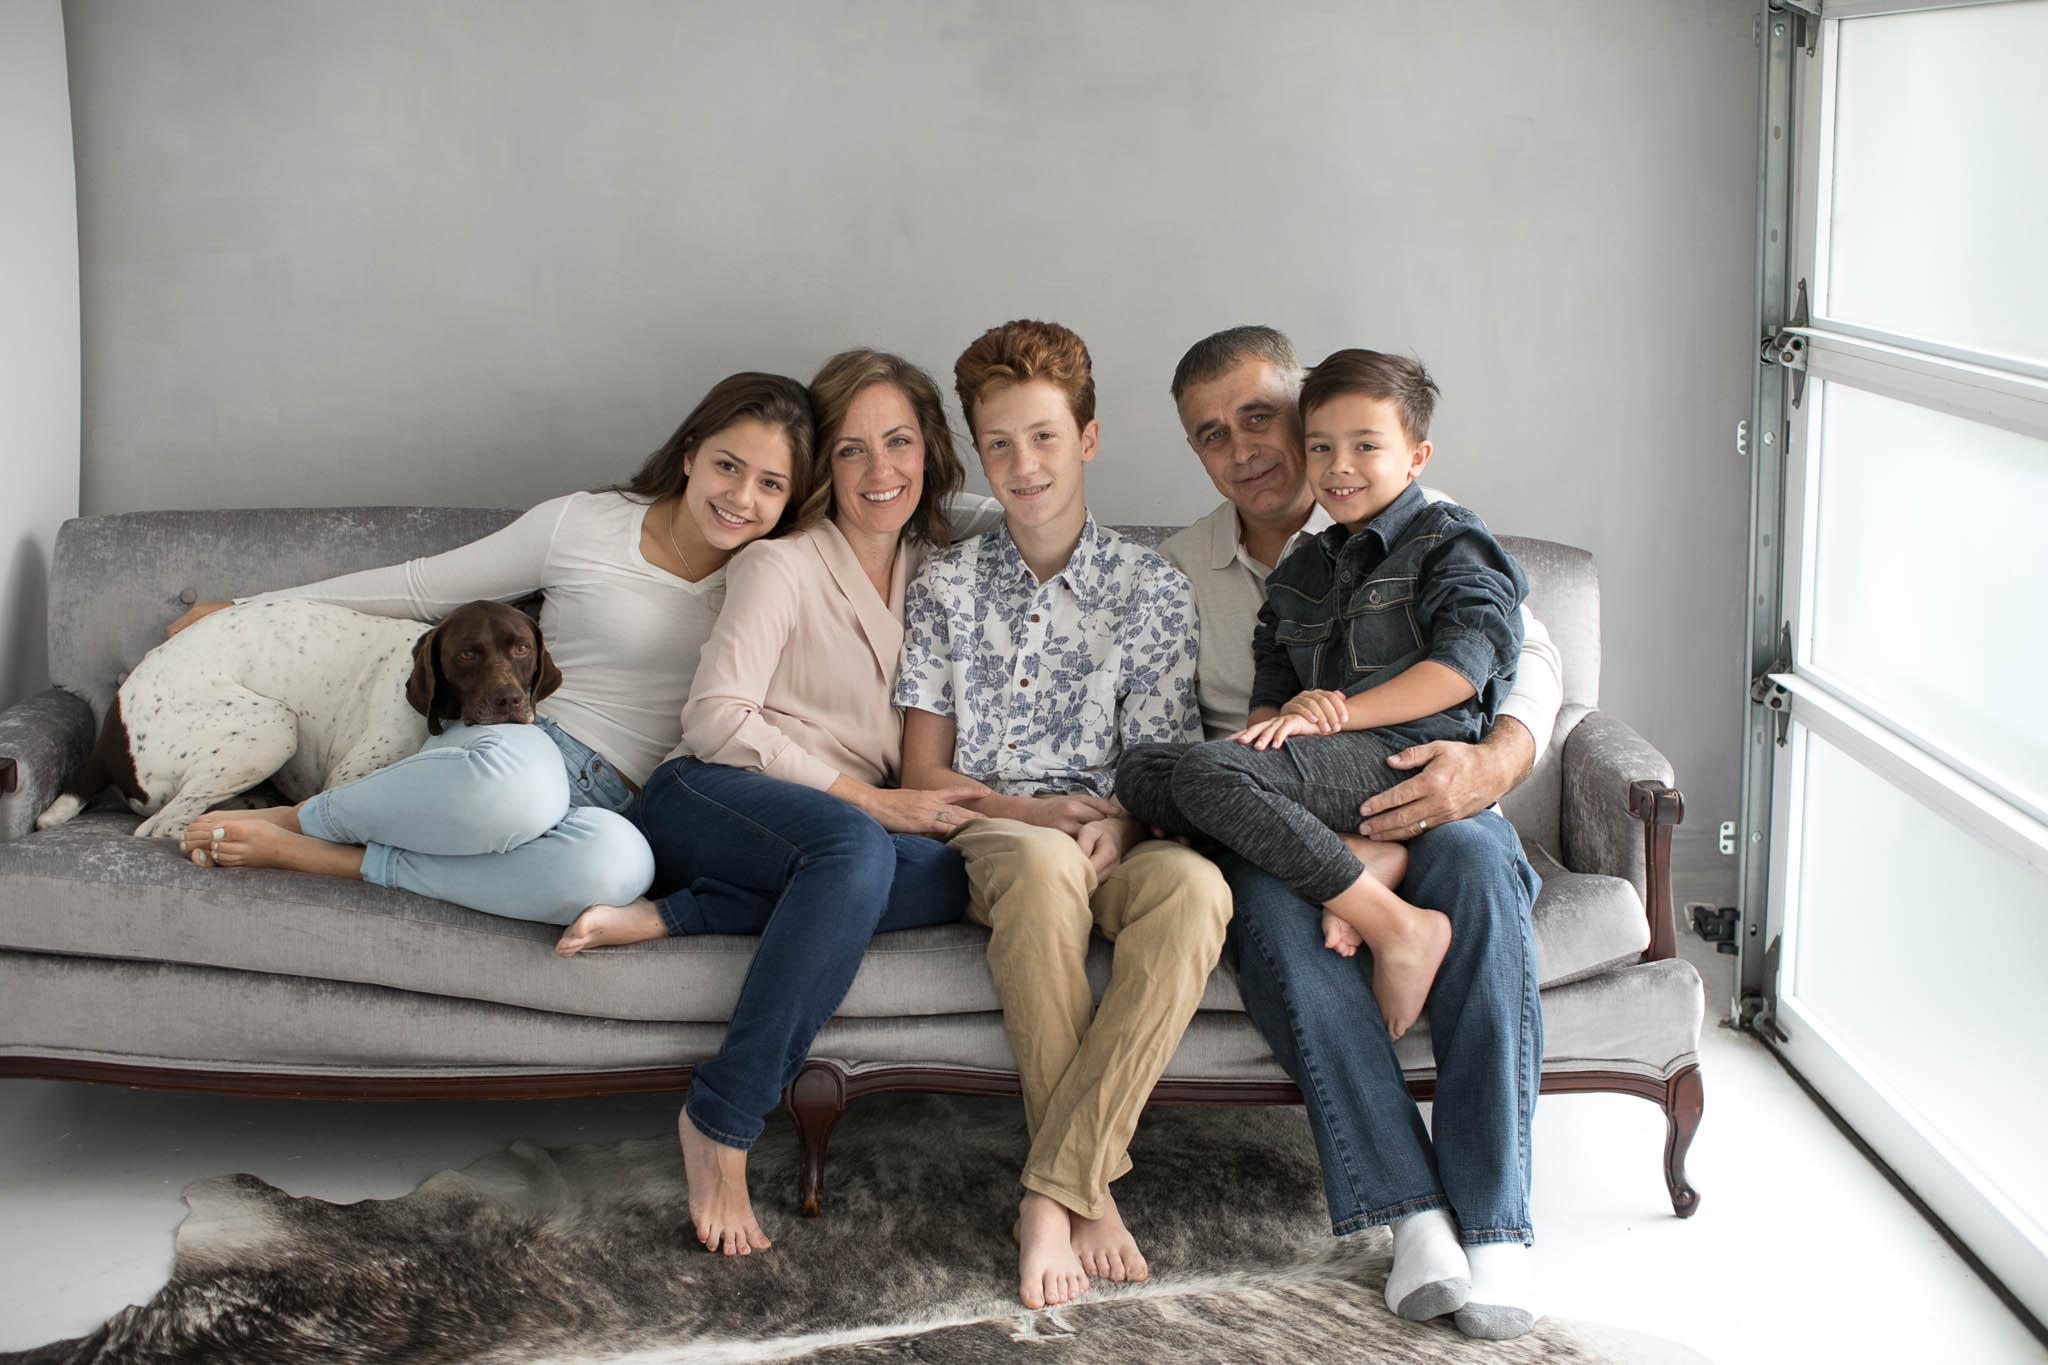 002-emma_family.jpg